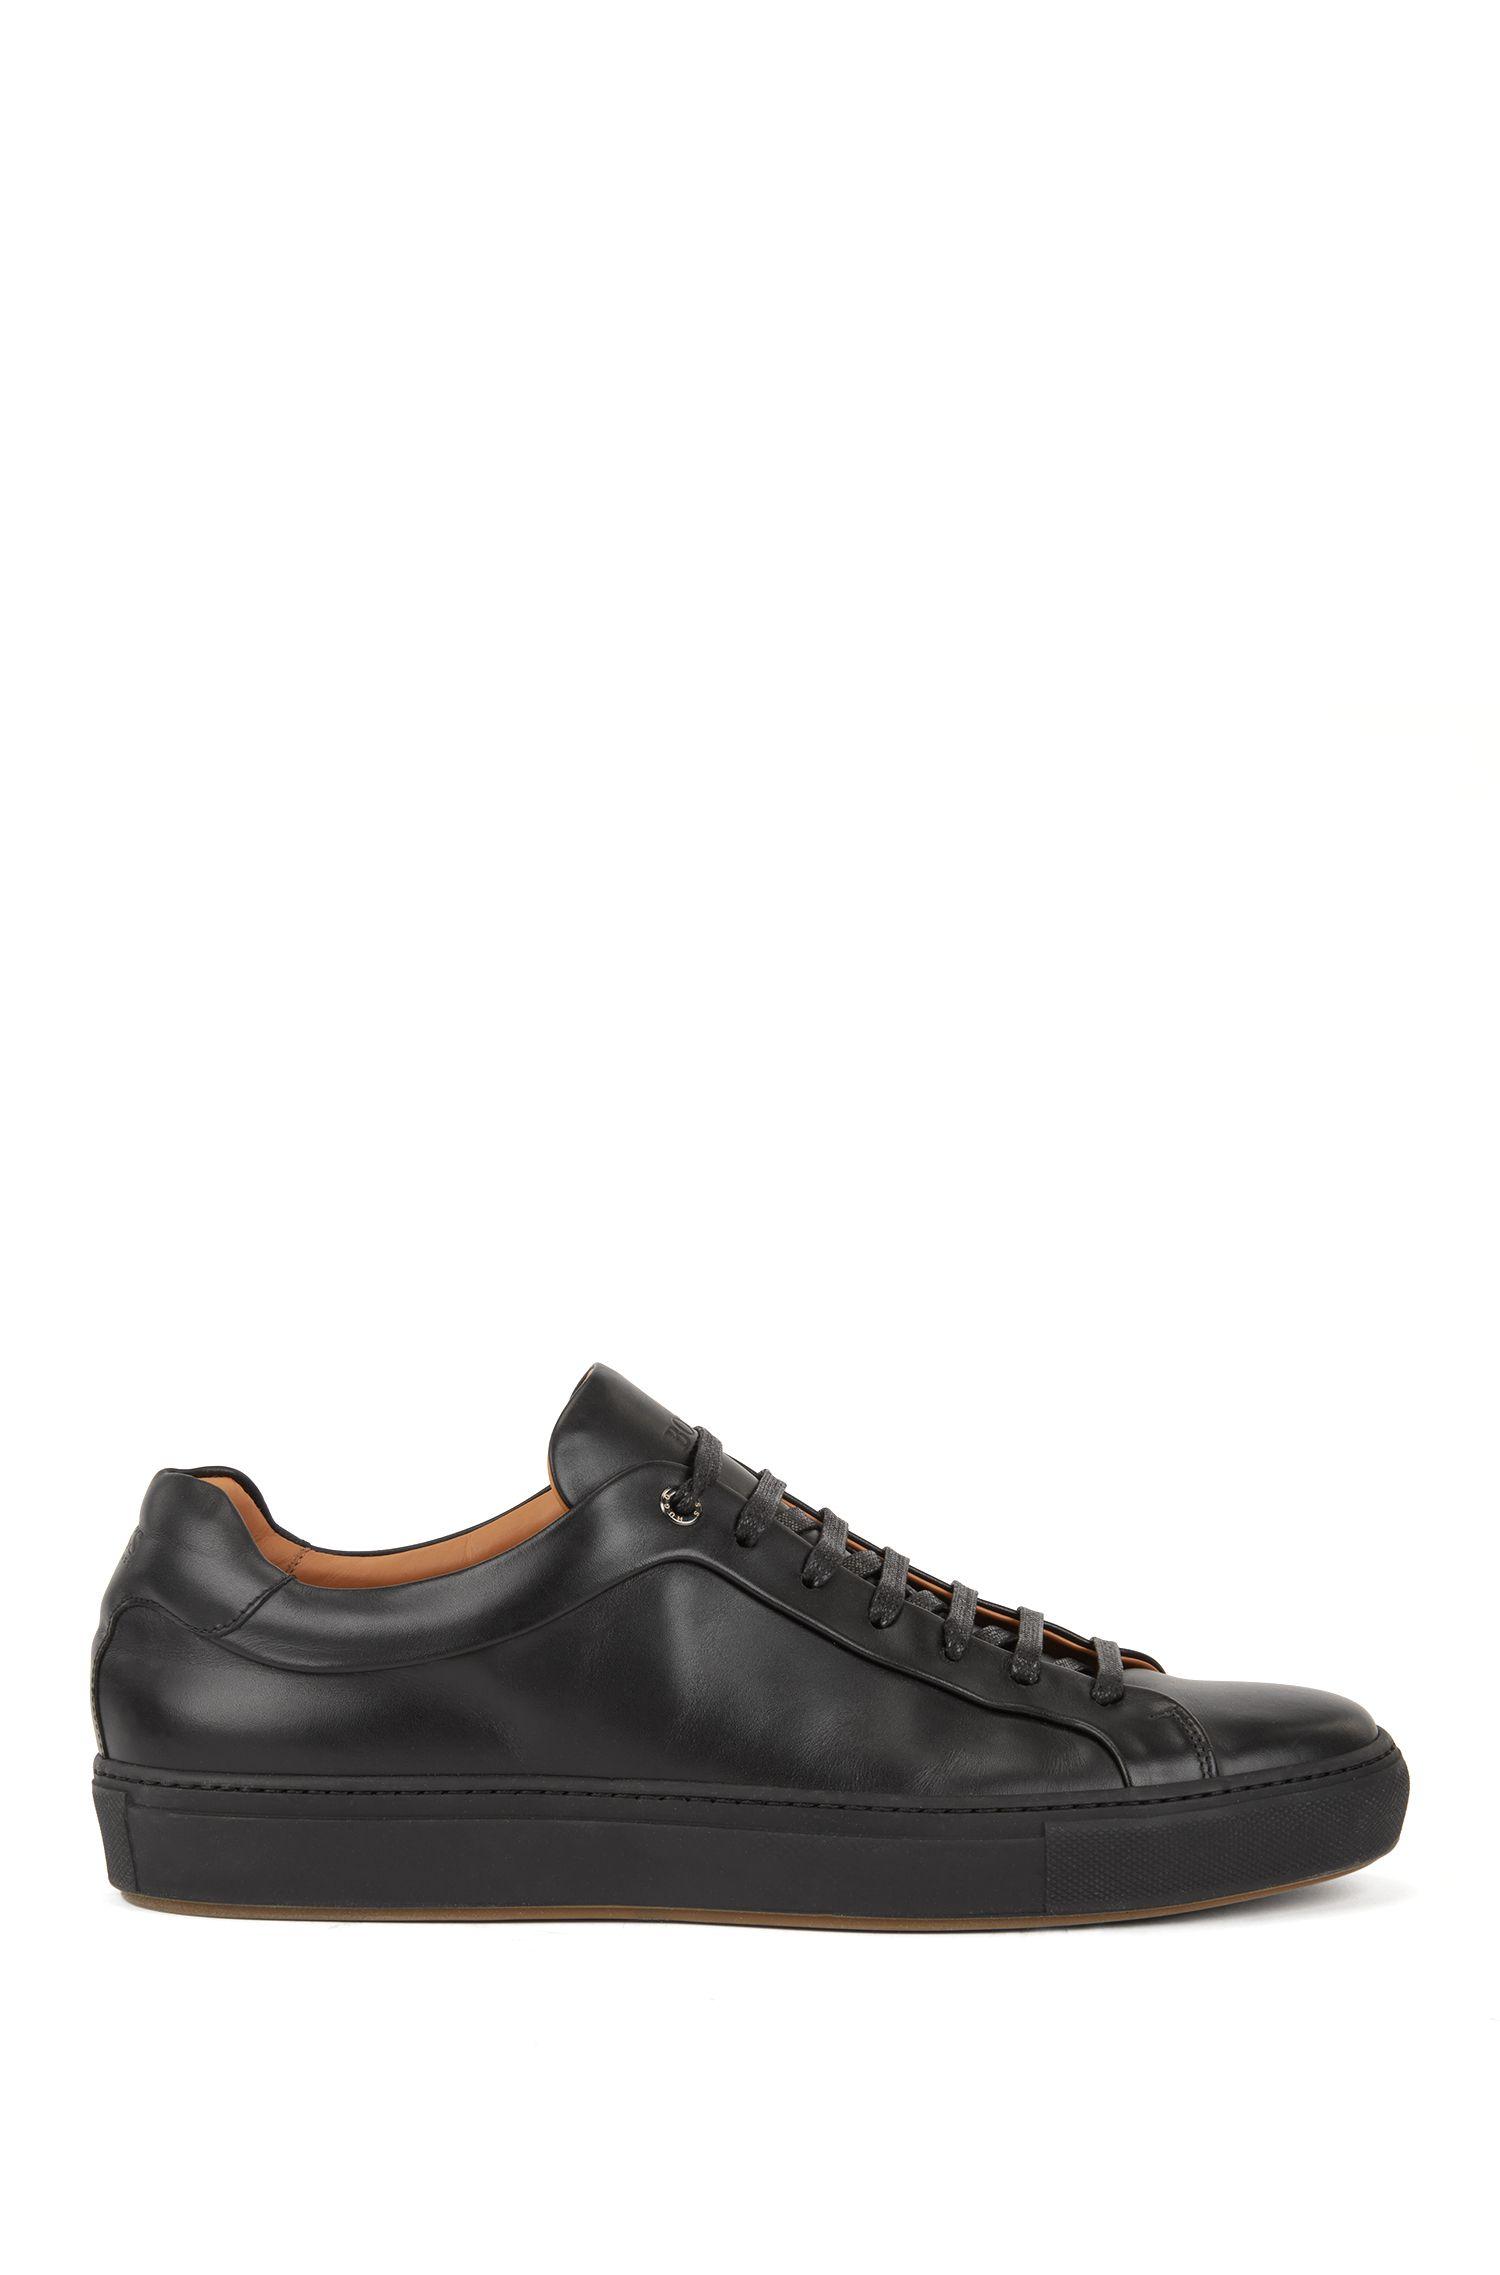 Leder-Sneakers im Tennis-Stil, Schwarz